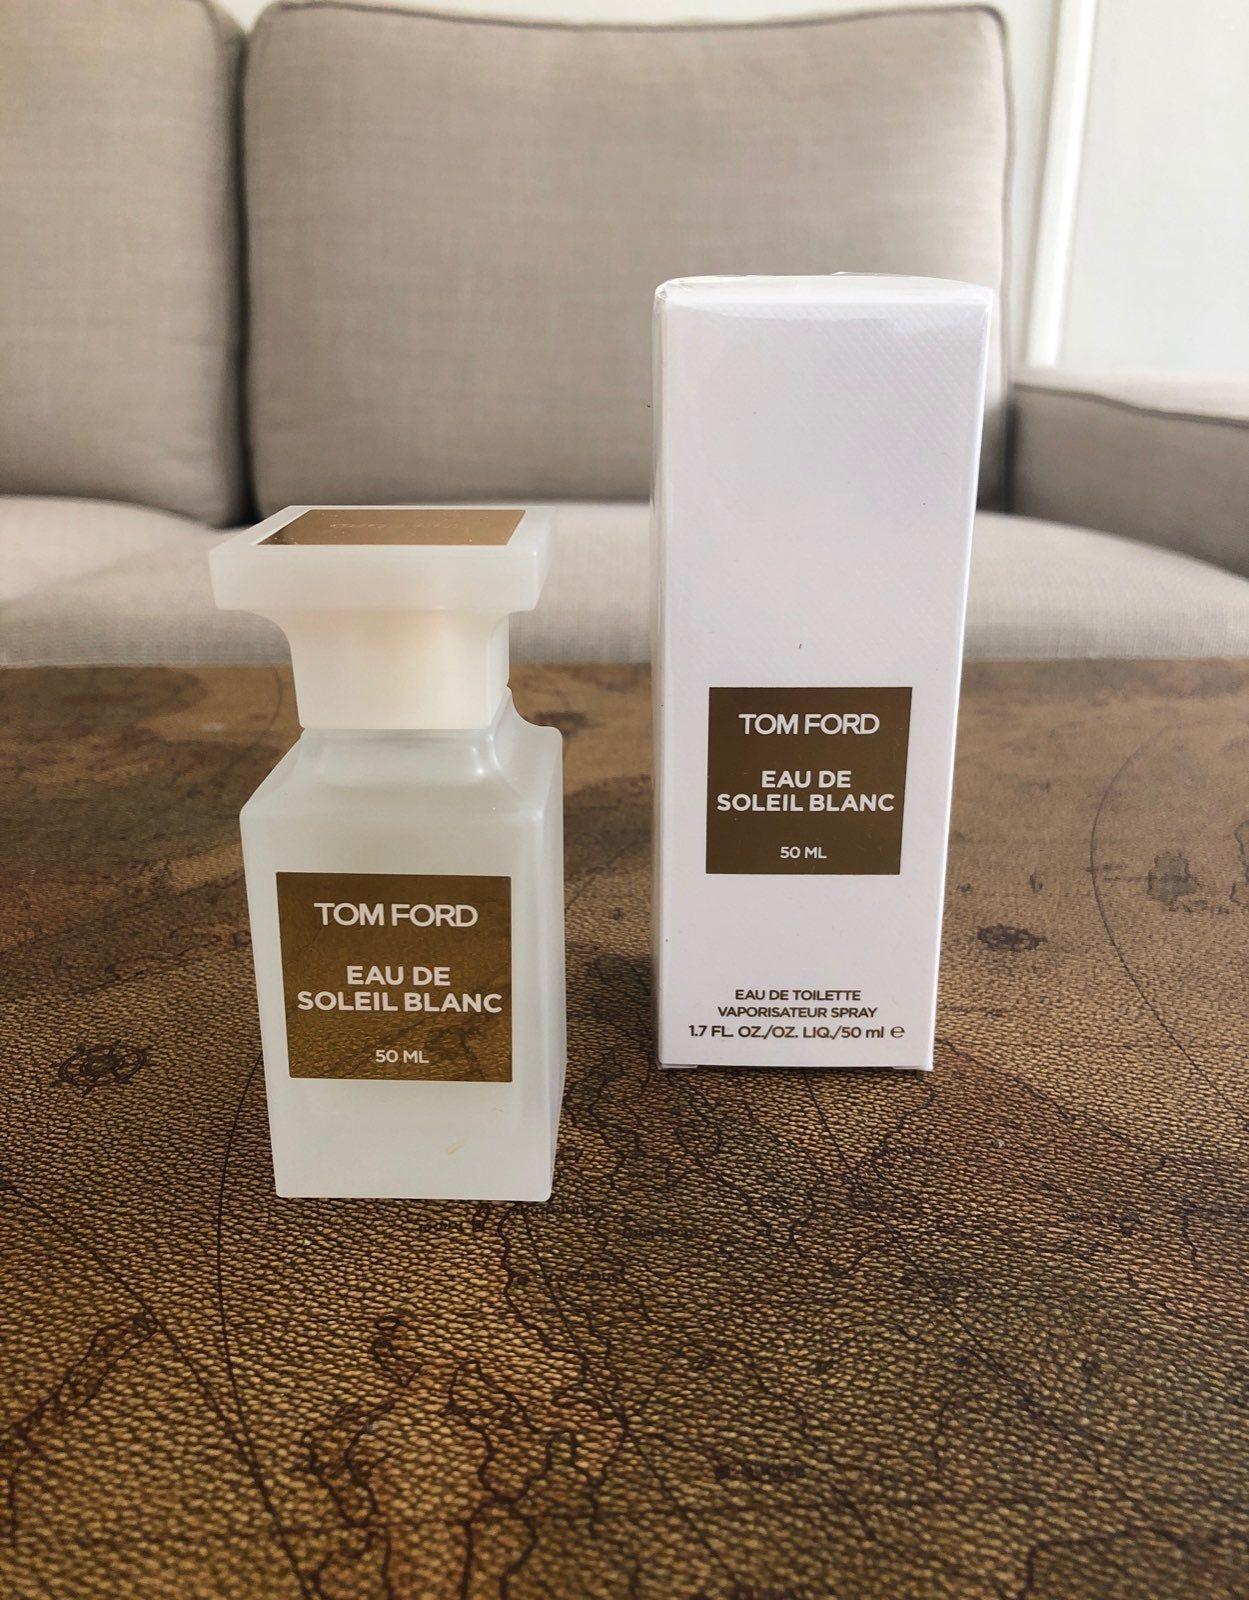 Crisp Radiant Addictive Eau De Soleil Blanc Embodies A Refreshing Illumination On Private Blend Soleil Cosmetics Fragrance Men Perfume Fragrances Perfume